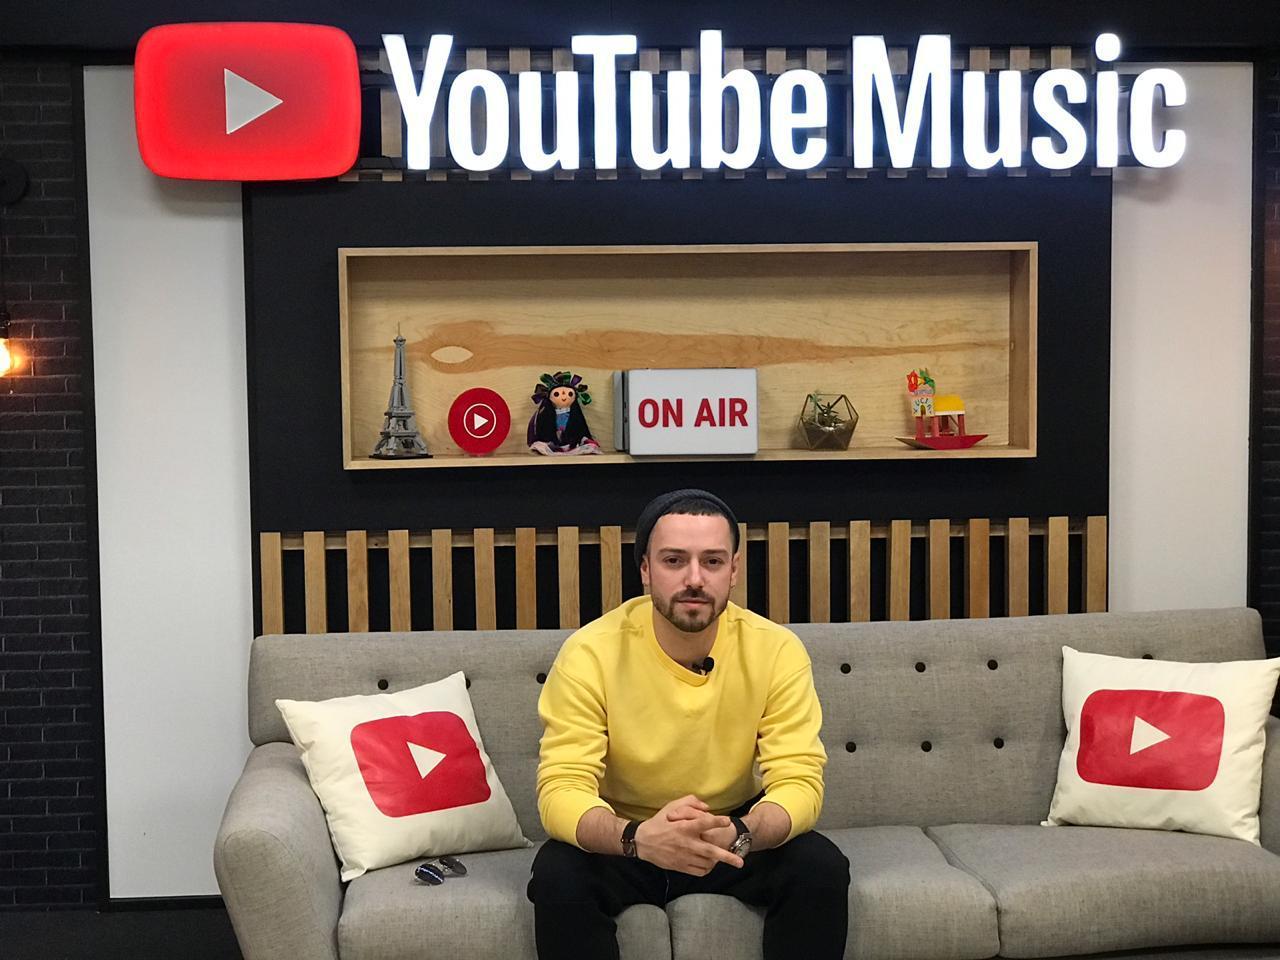 PeeWee en YouTube